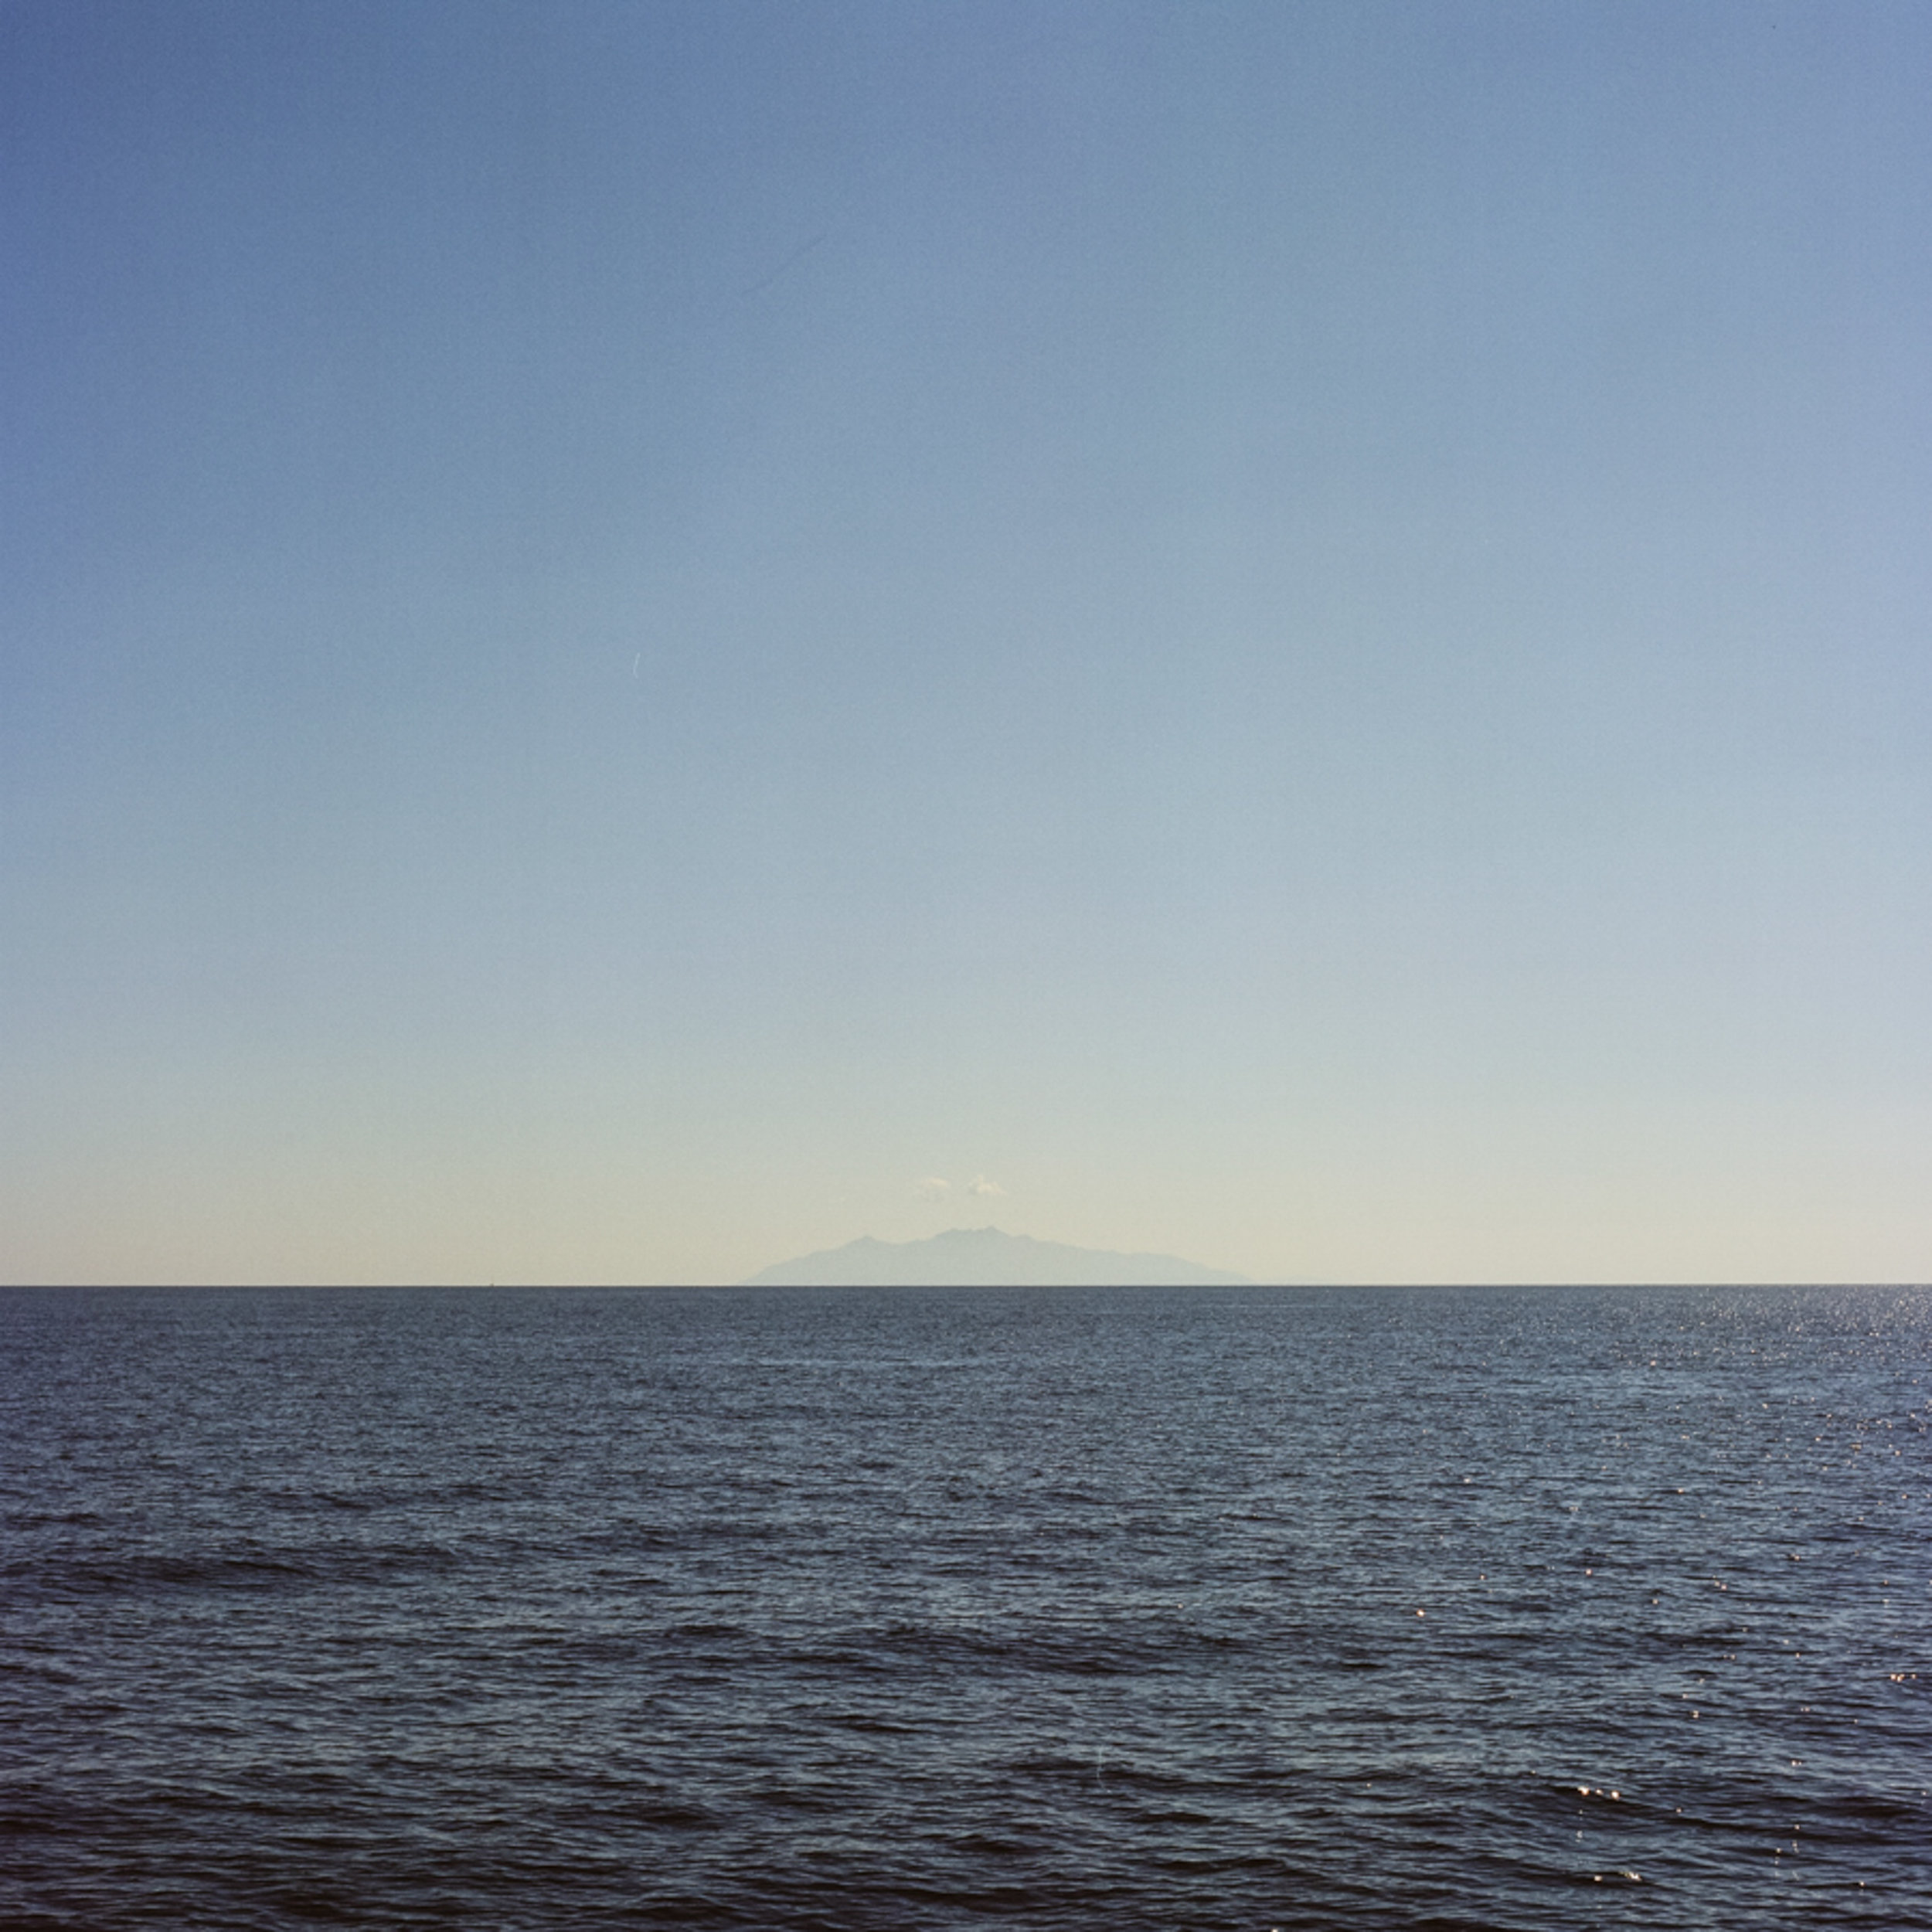 Charles_Roussel-Island-6.jpg